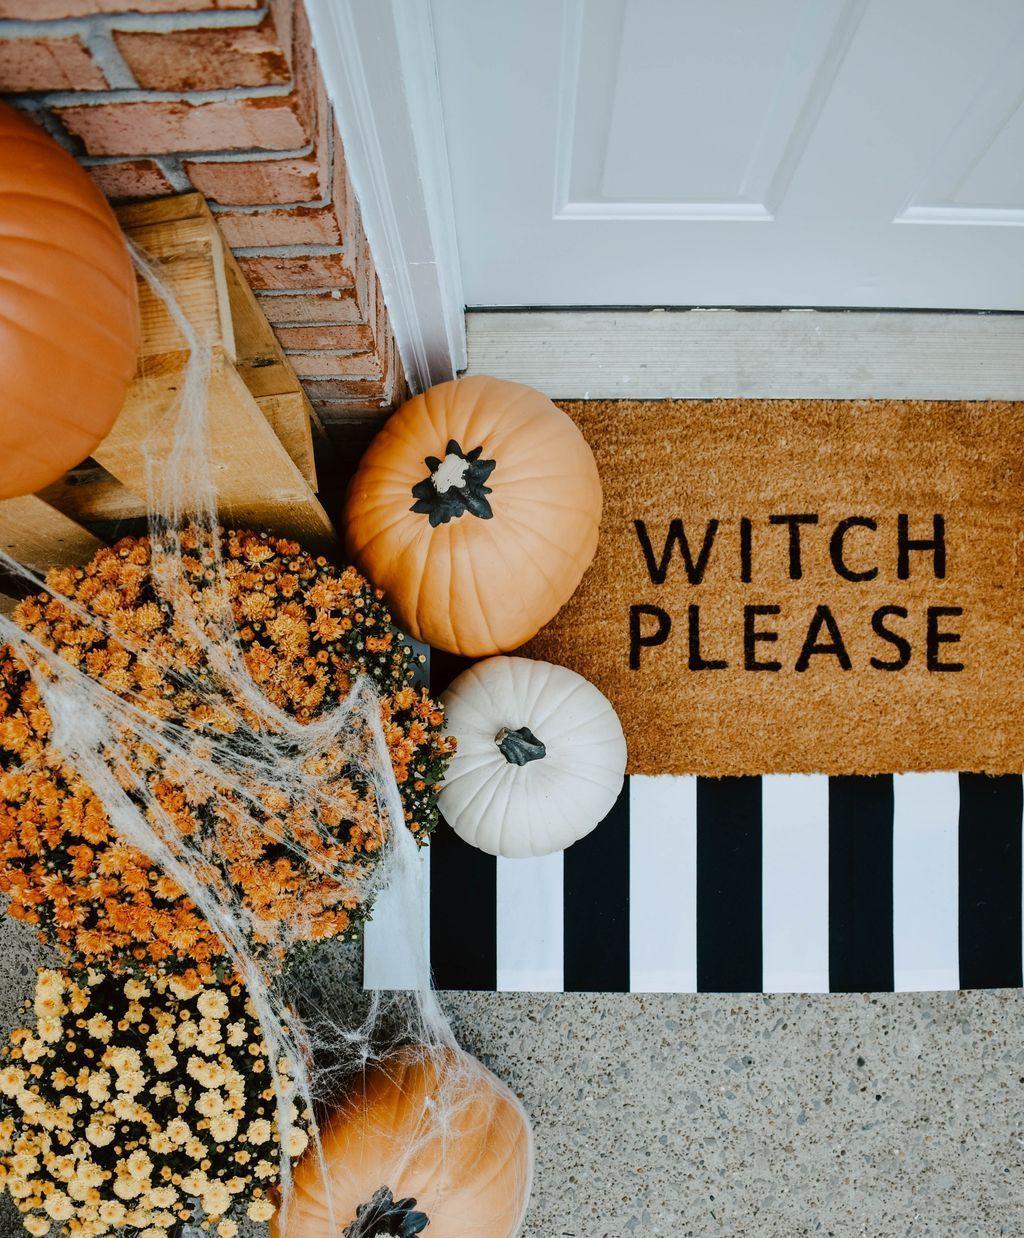 32 schöne Outdoor-Herbstdekor-Ideen - #herbstdekor #ideen #outdoor #schone - #HomeDecorIdeas